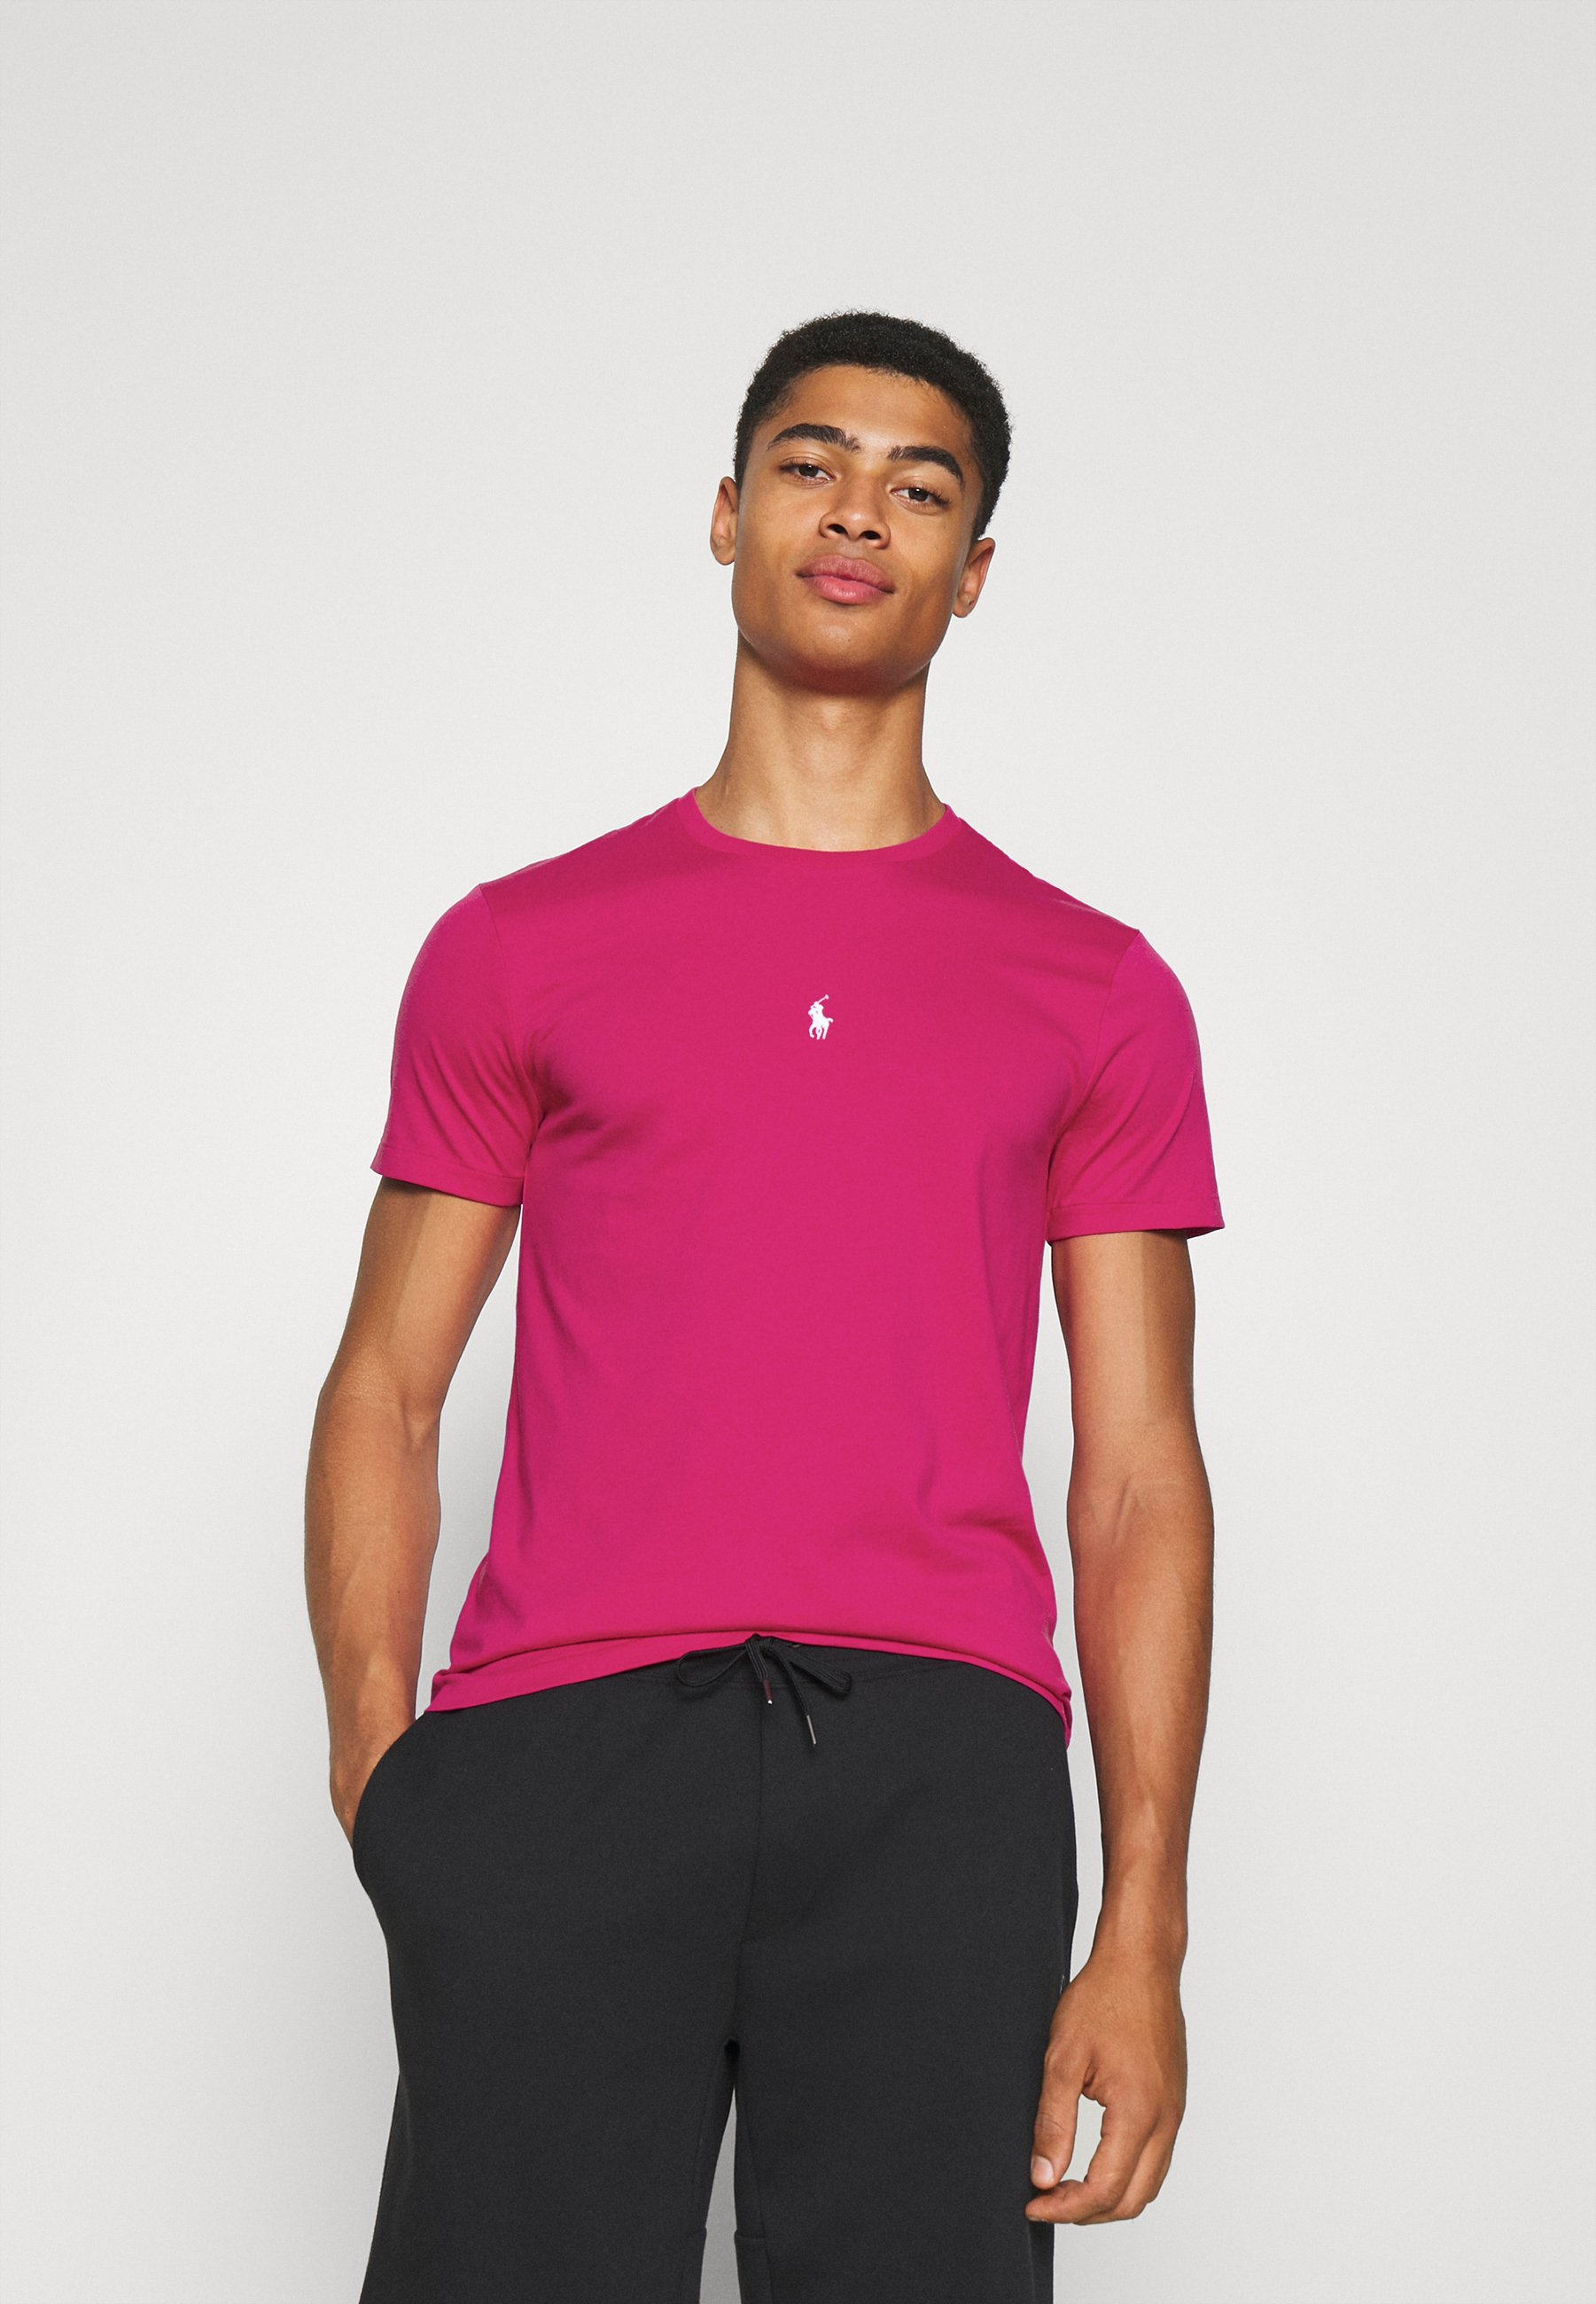 Men CUSTOM SLIM FIT JERSEY T-SHIRT - Basic T-shirt